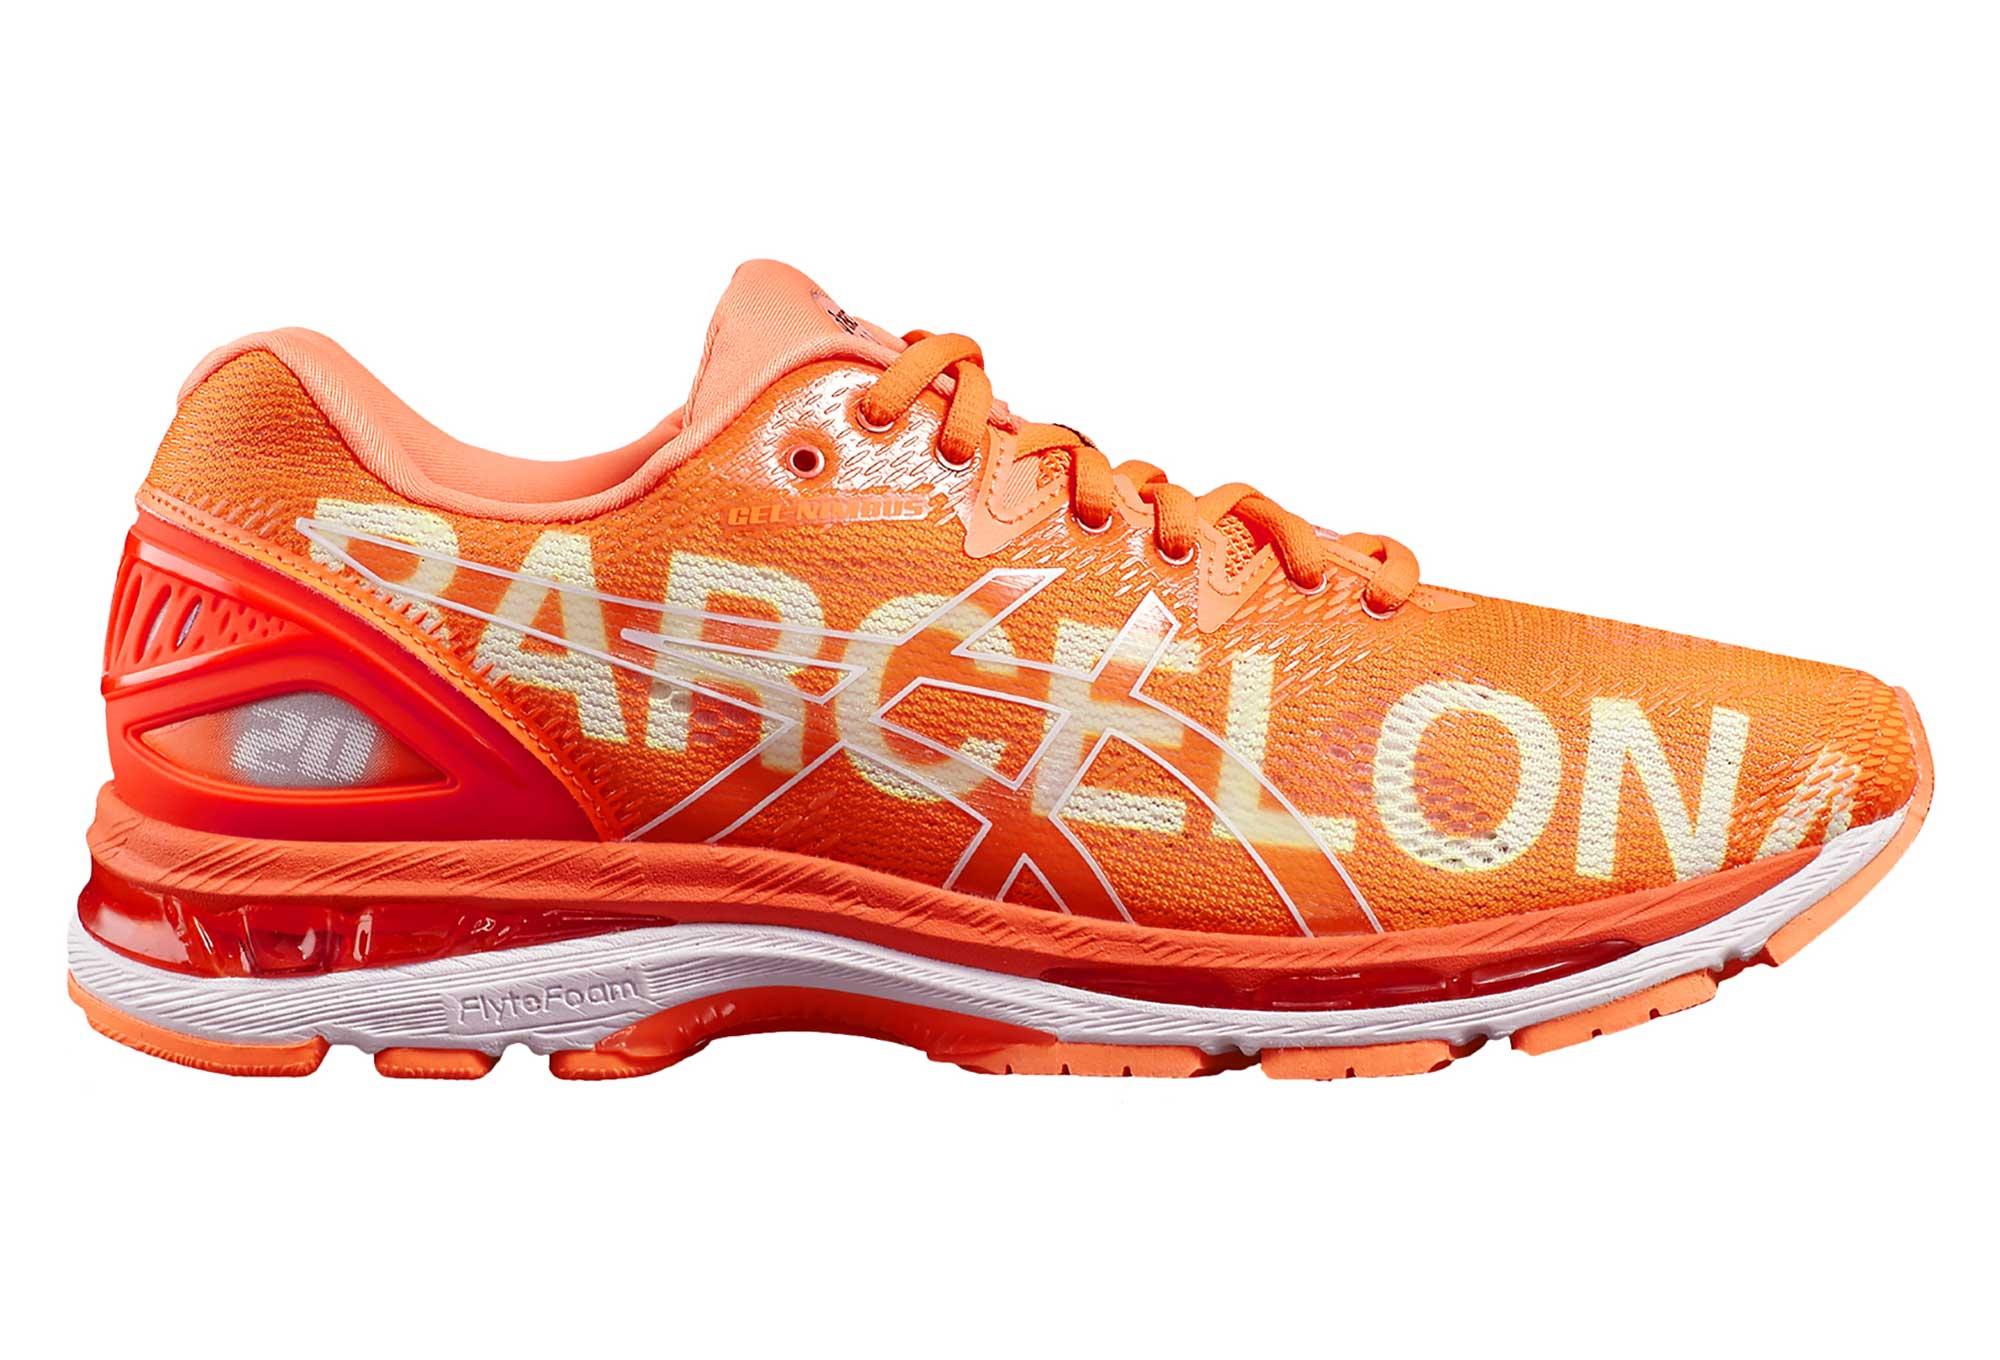 f6ebc6d7ae465 Zapatillas Asics Gel-Nimbus 20 Barcelona Marathon para Hombre Naranja    Blanco